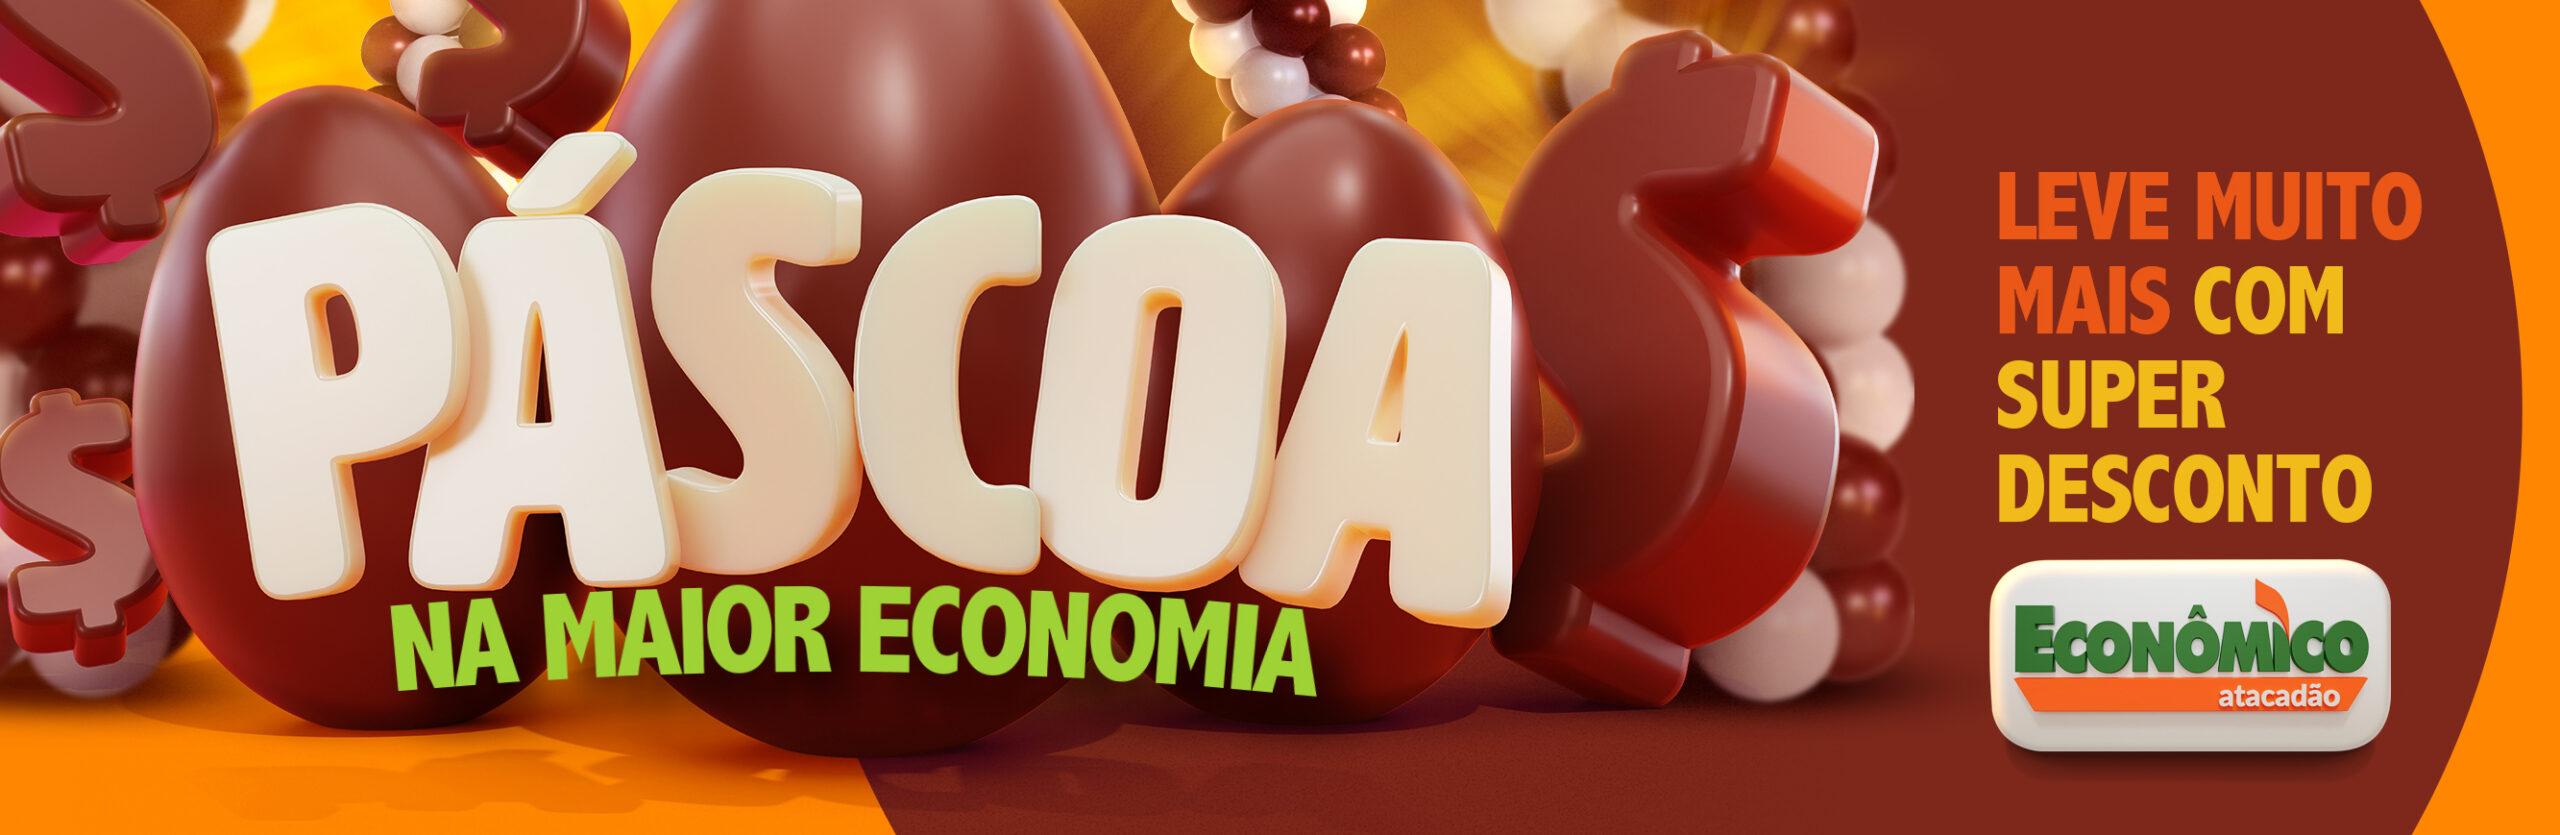 Páscoa Econômico